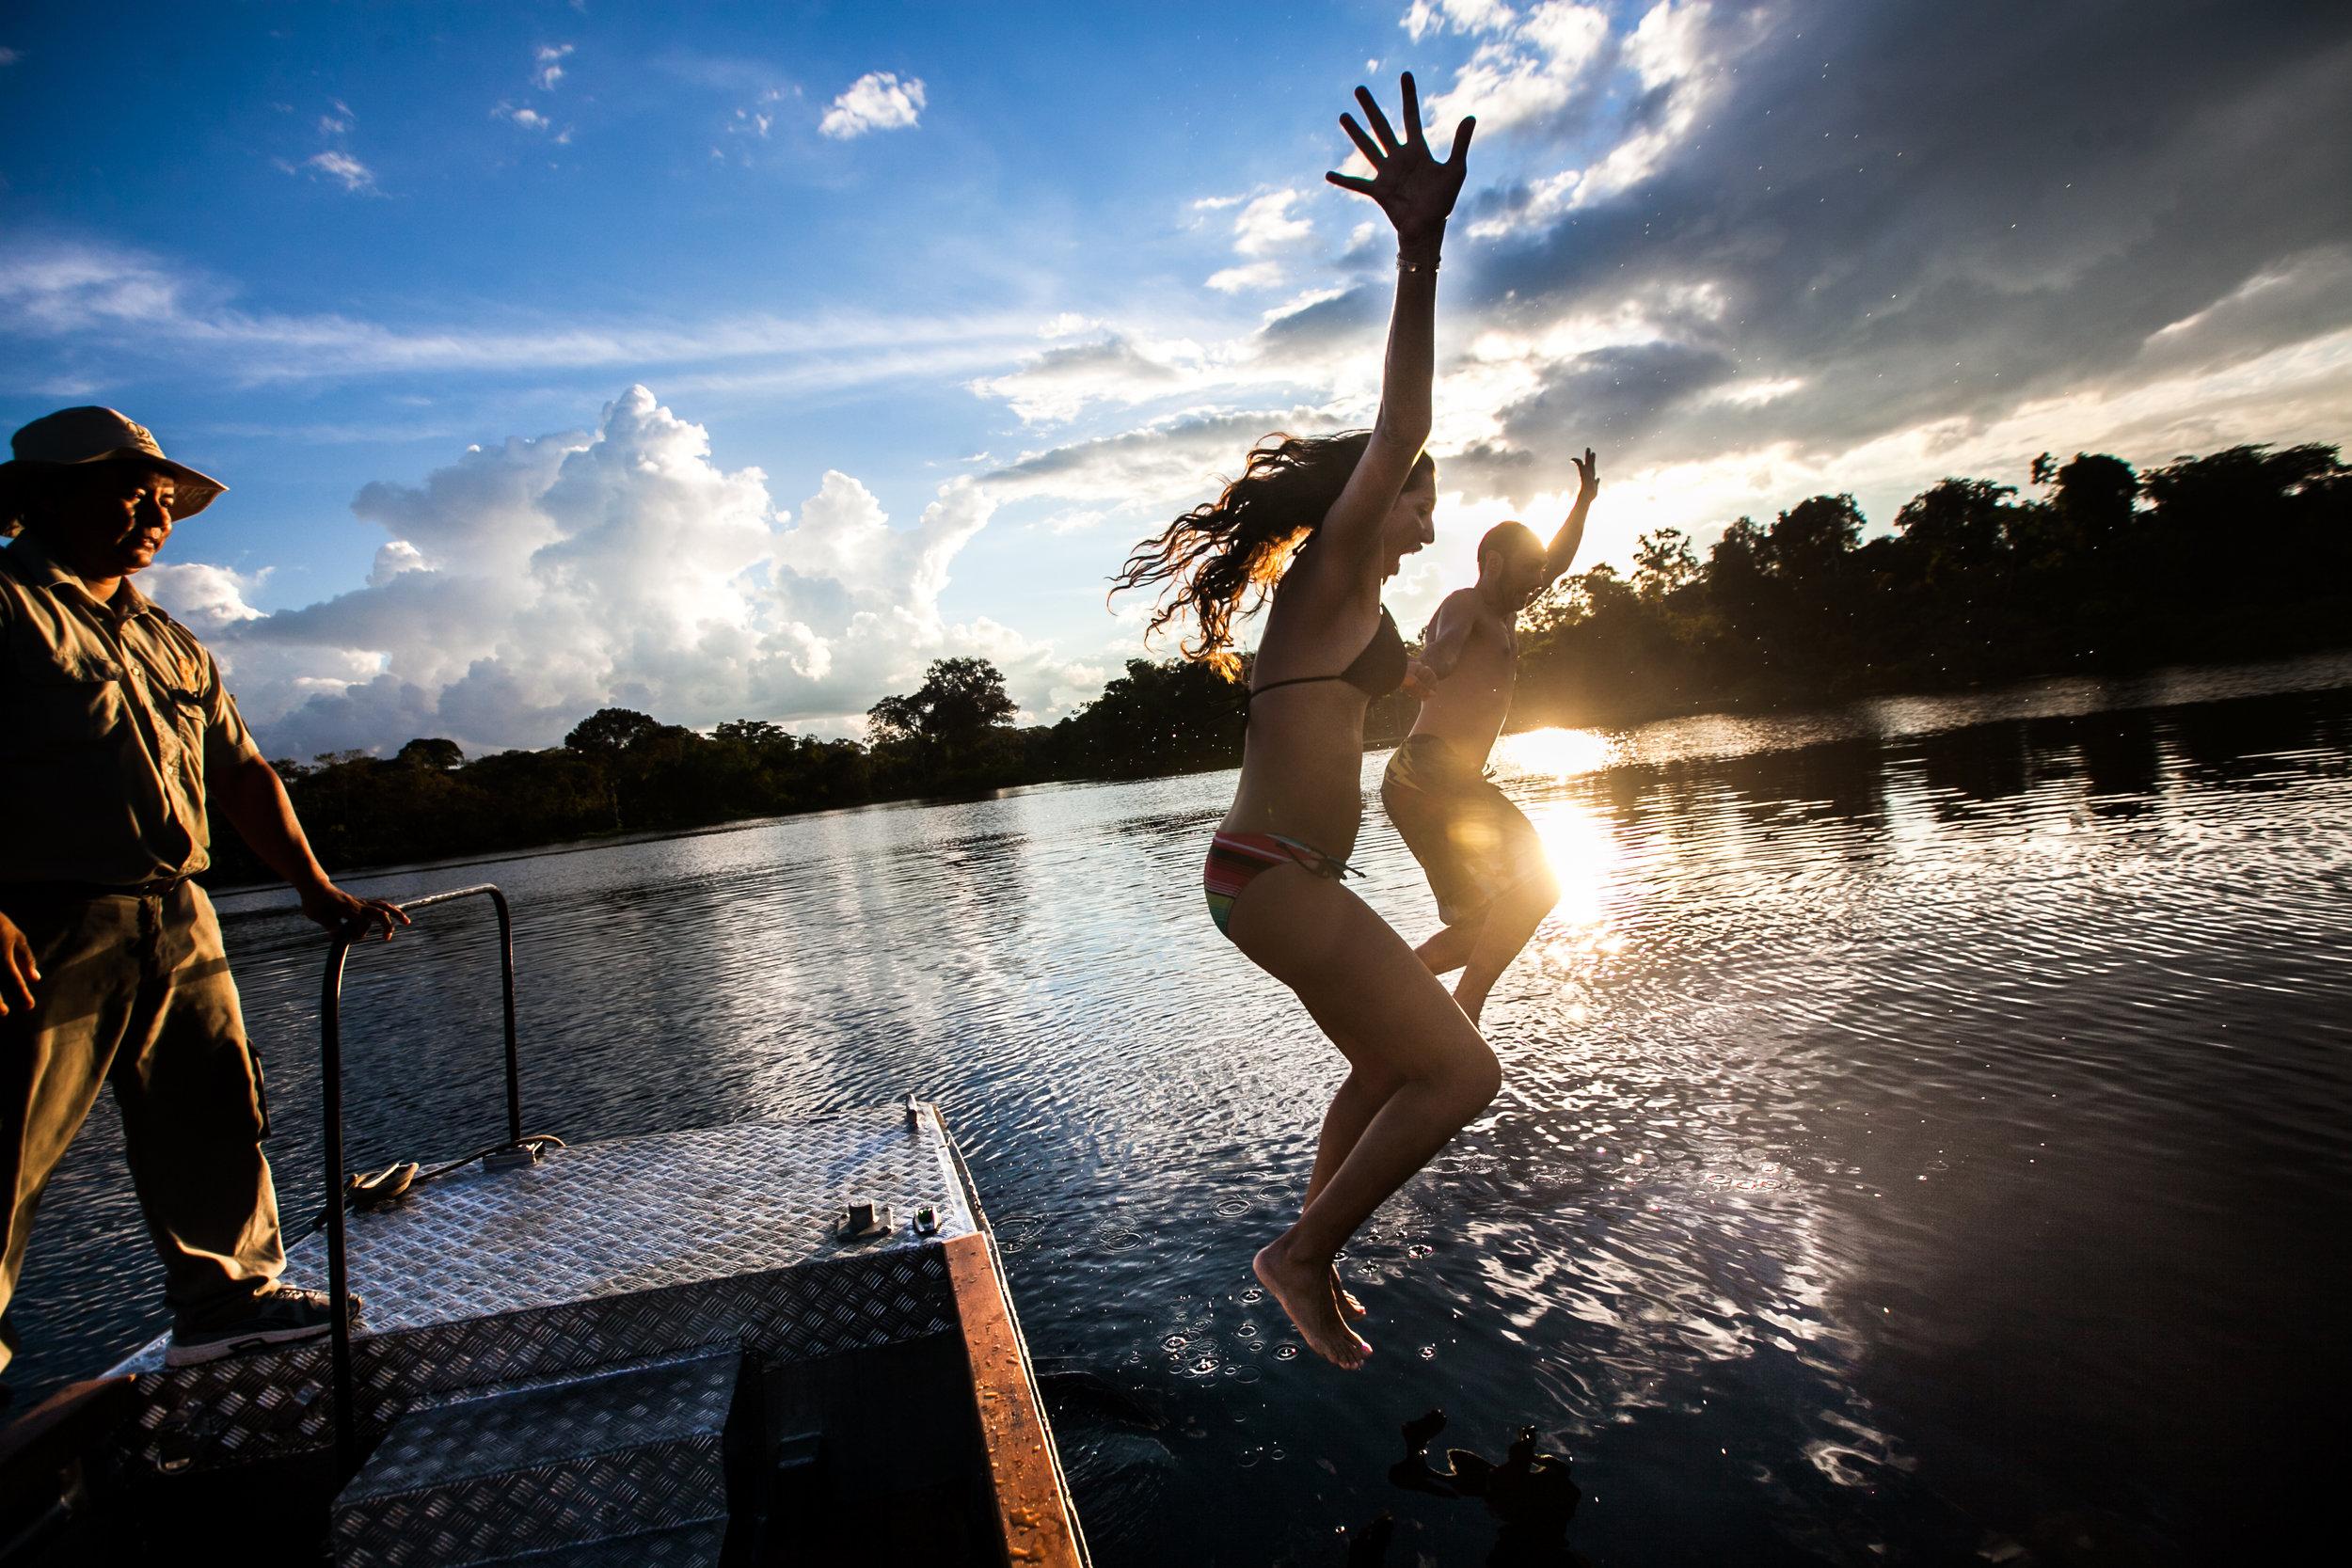 Swimming in the Amazon with Delfin Amazon Cruises